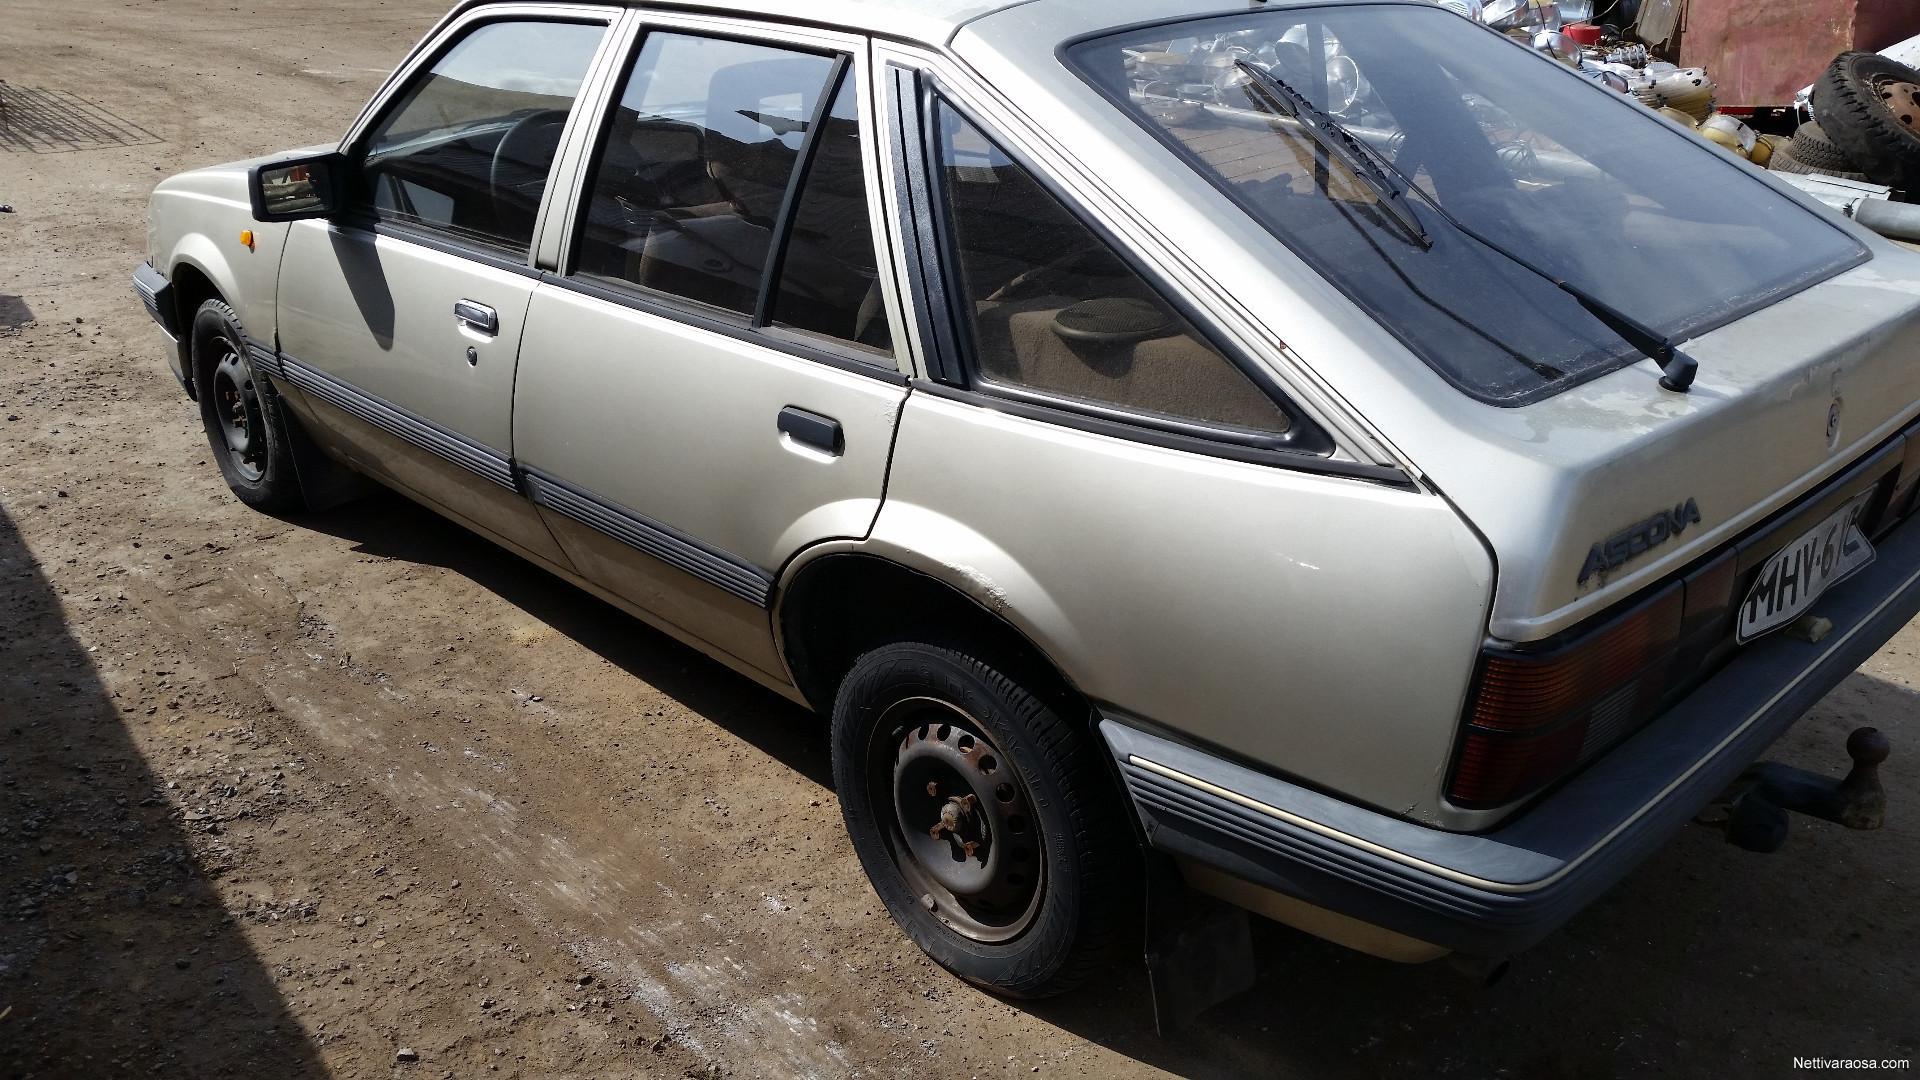 nettivaraosa opel ascona c 1 6 1986 spare and crash cars nettivaraosa. Black Bedroom Furniture Sets. Home Design Ideas